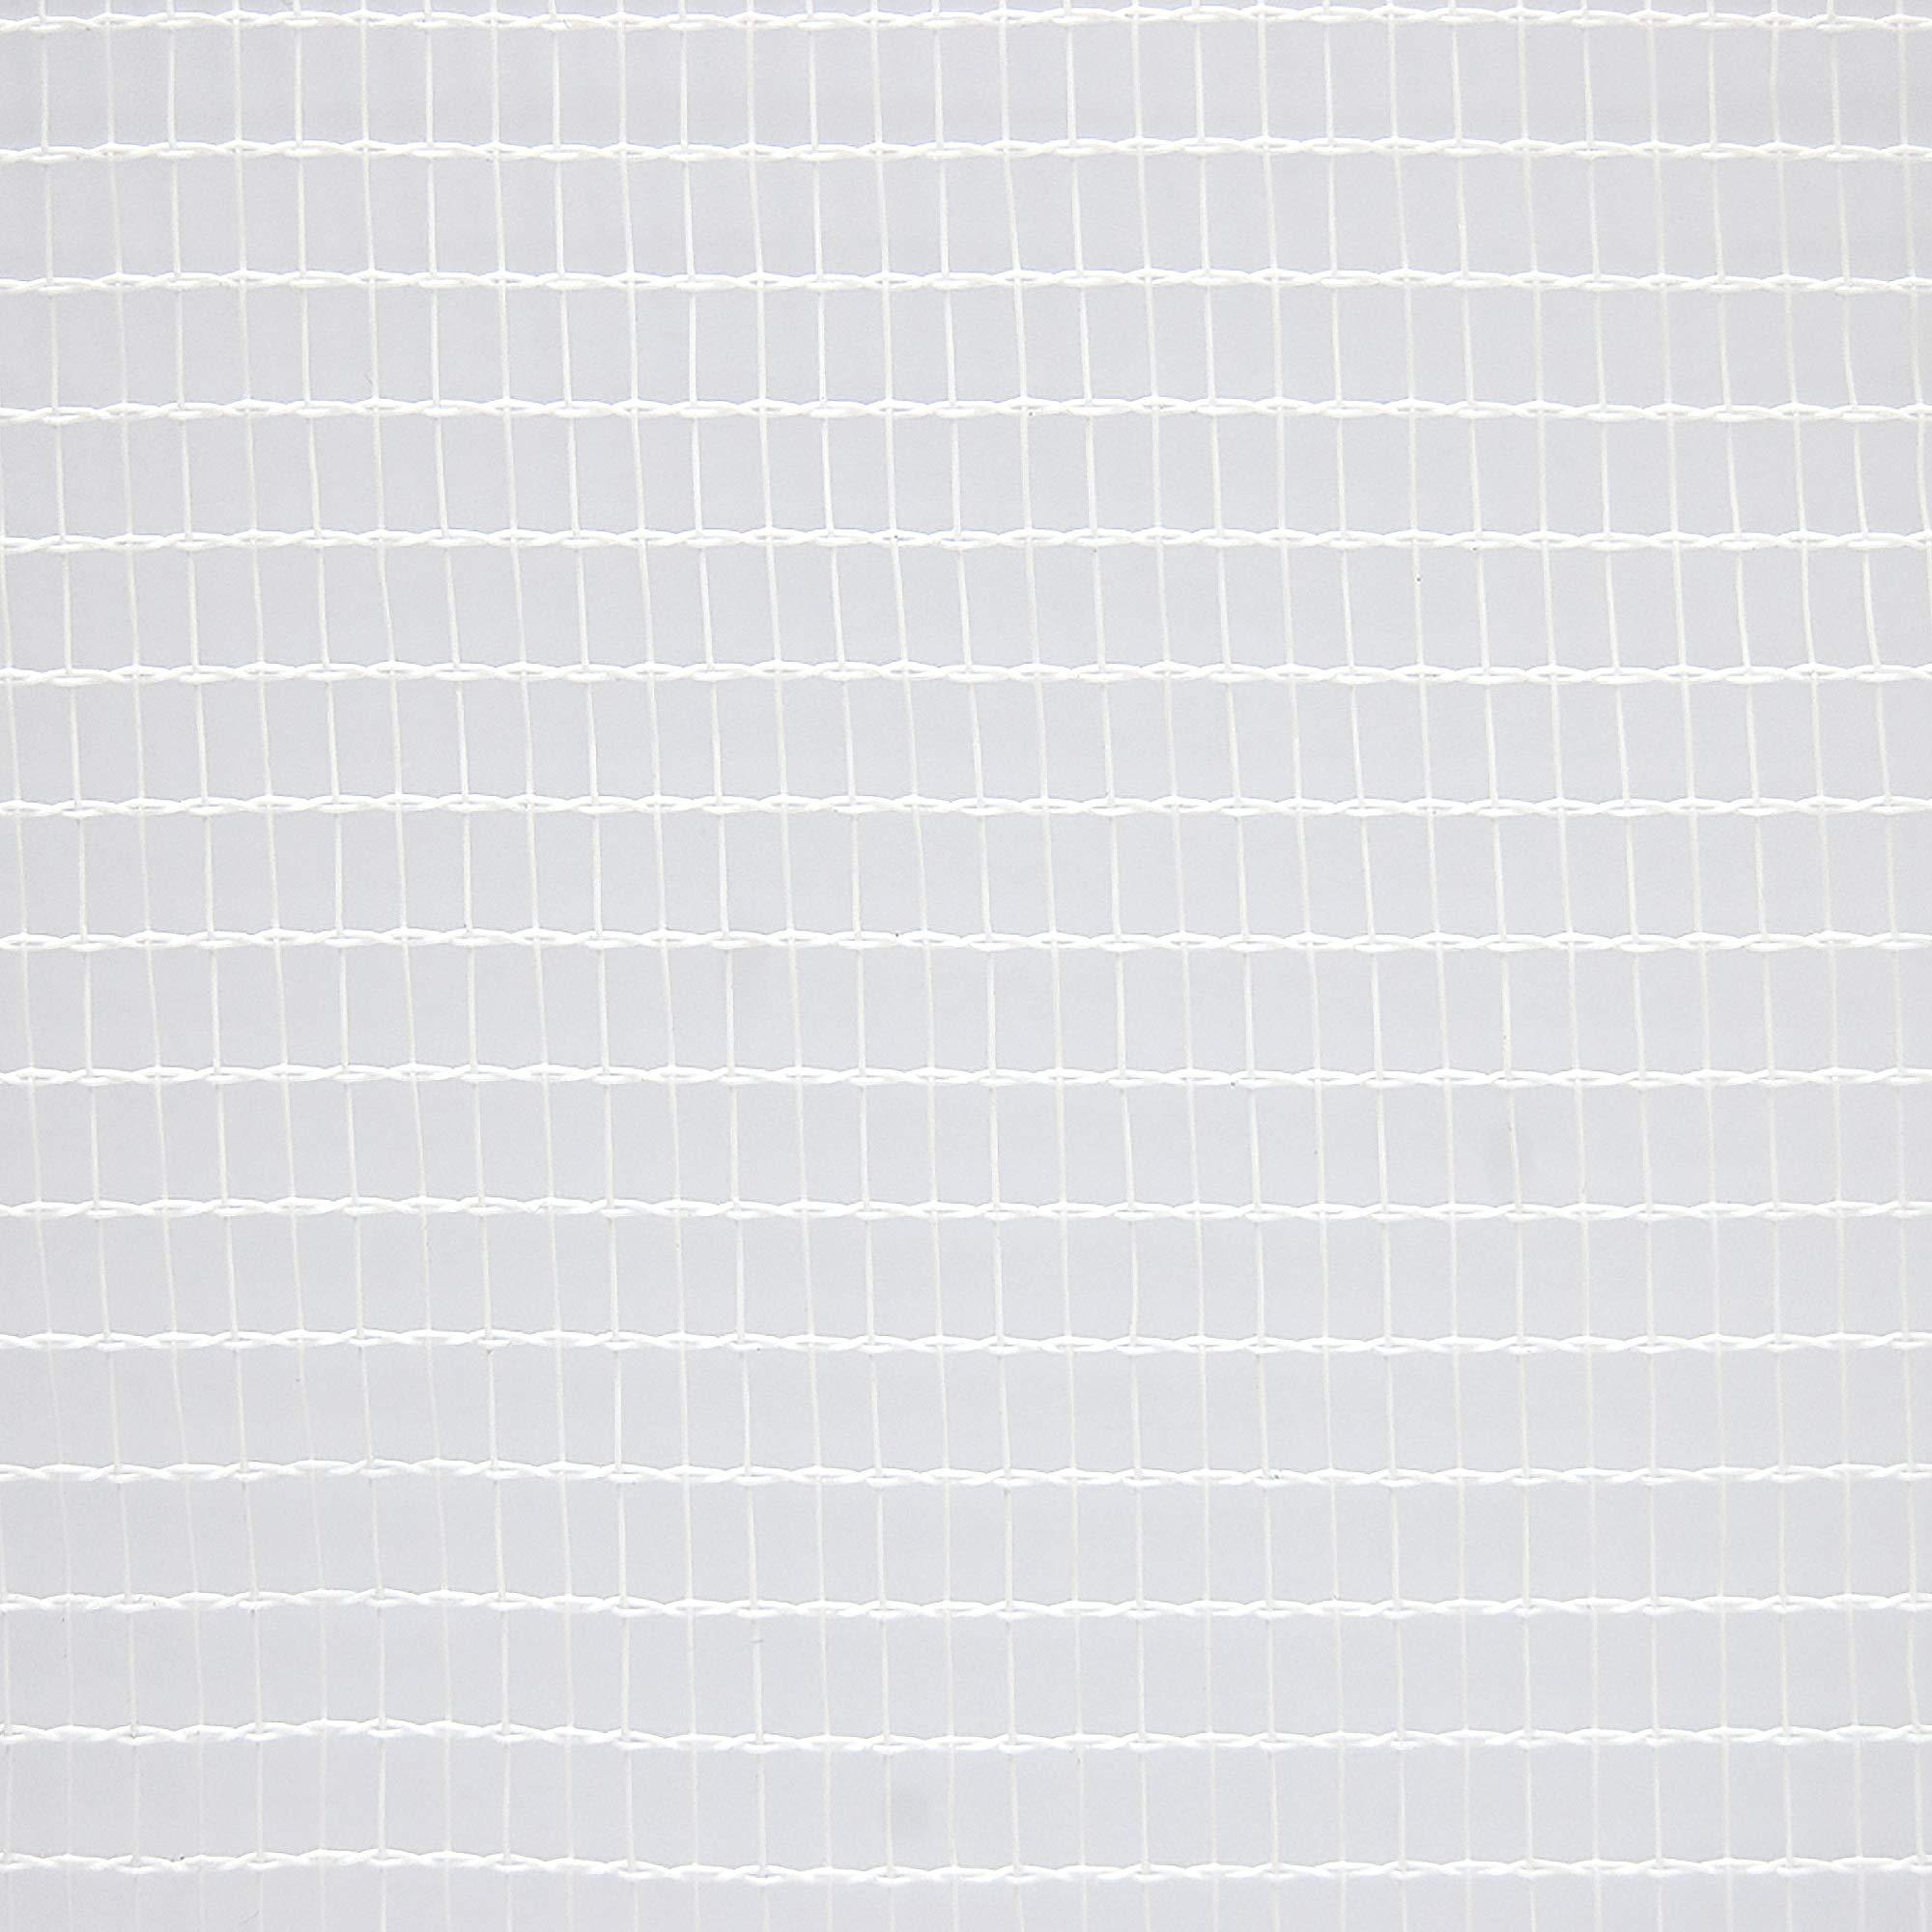 Grillage Anti-grêle Professionnel Blanc 4 x 5 m